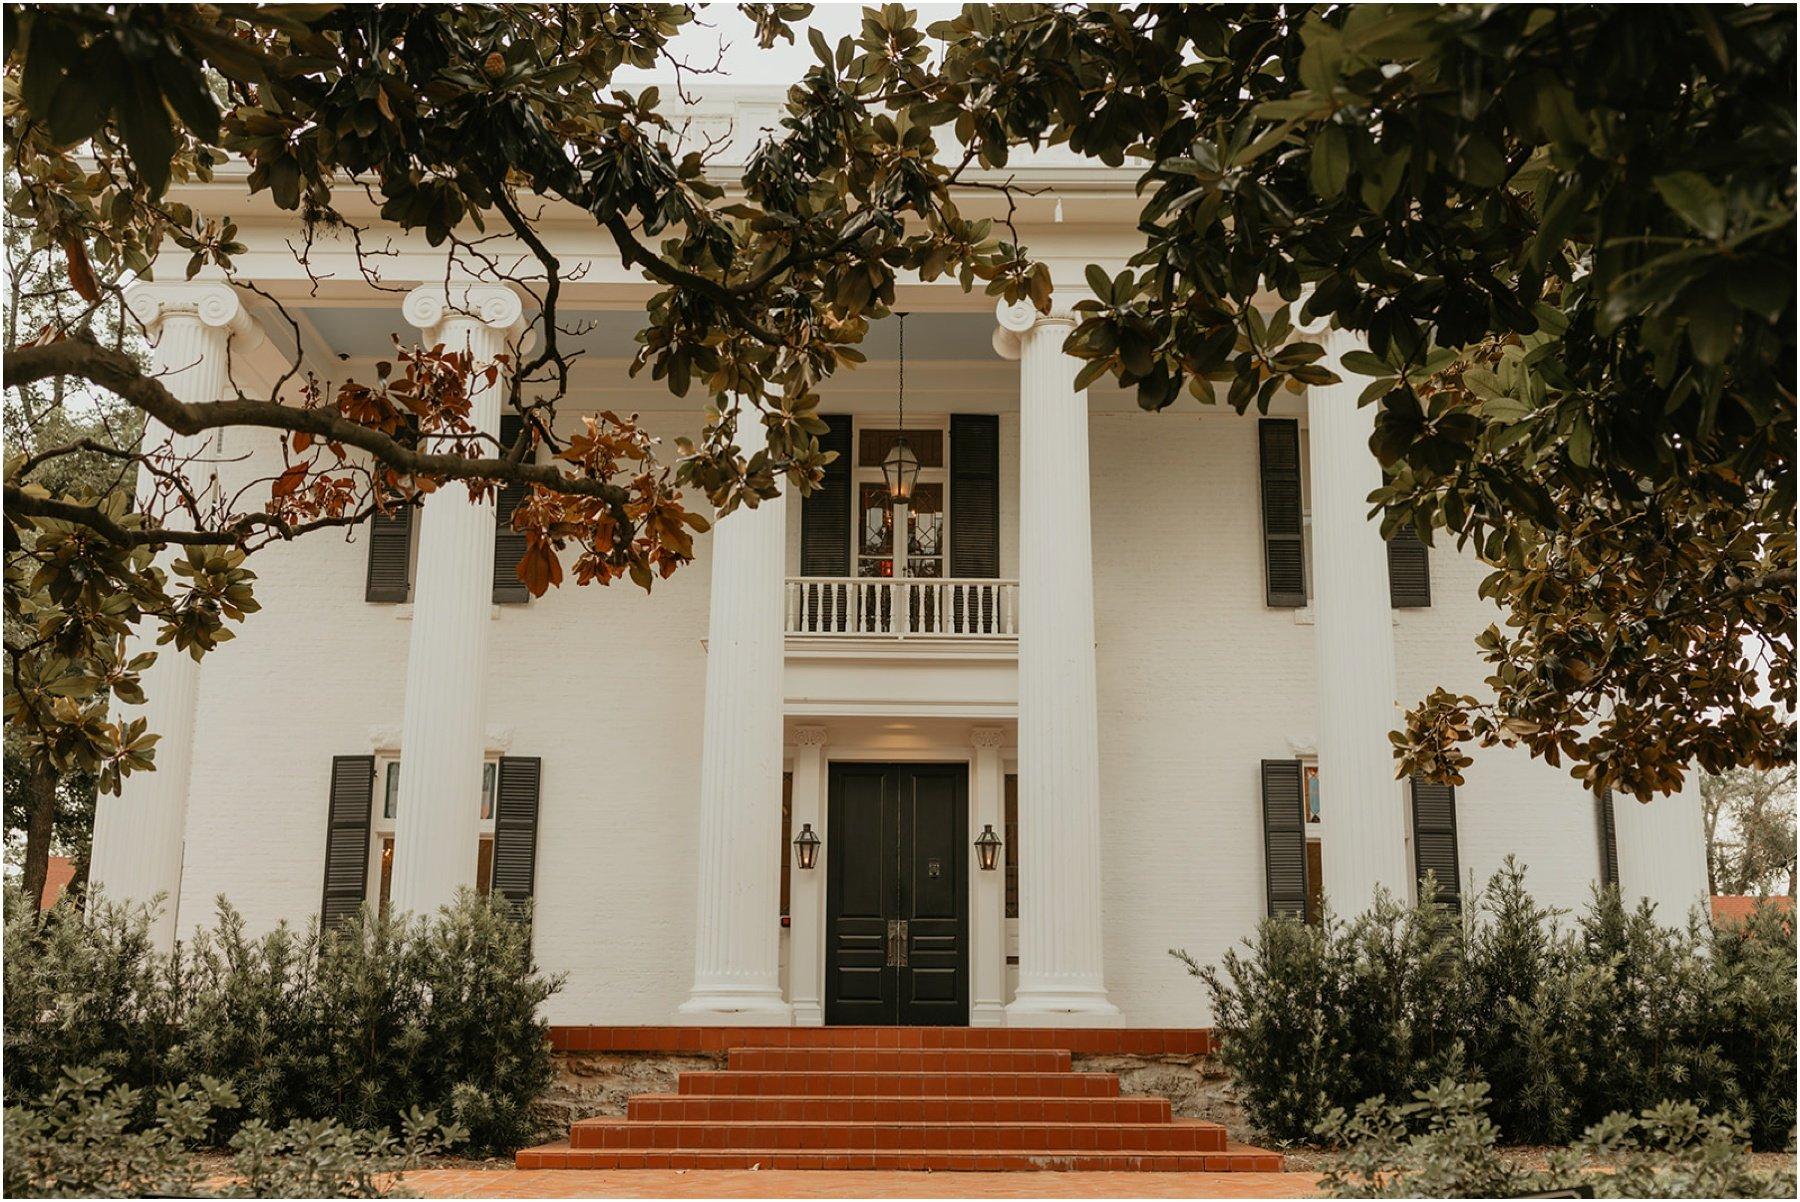 woodbine mansion wedding venue in austin, texas